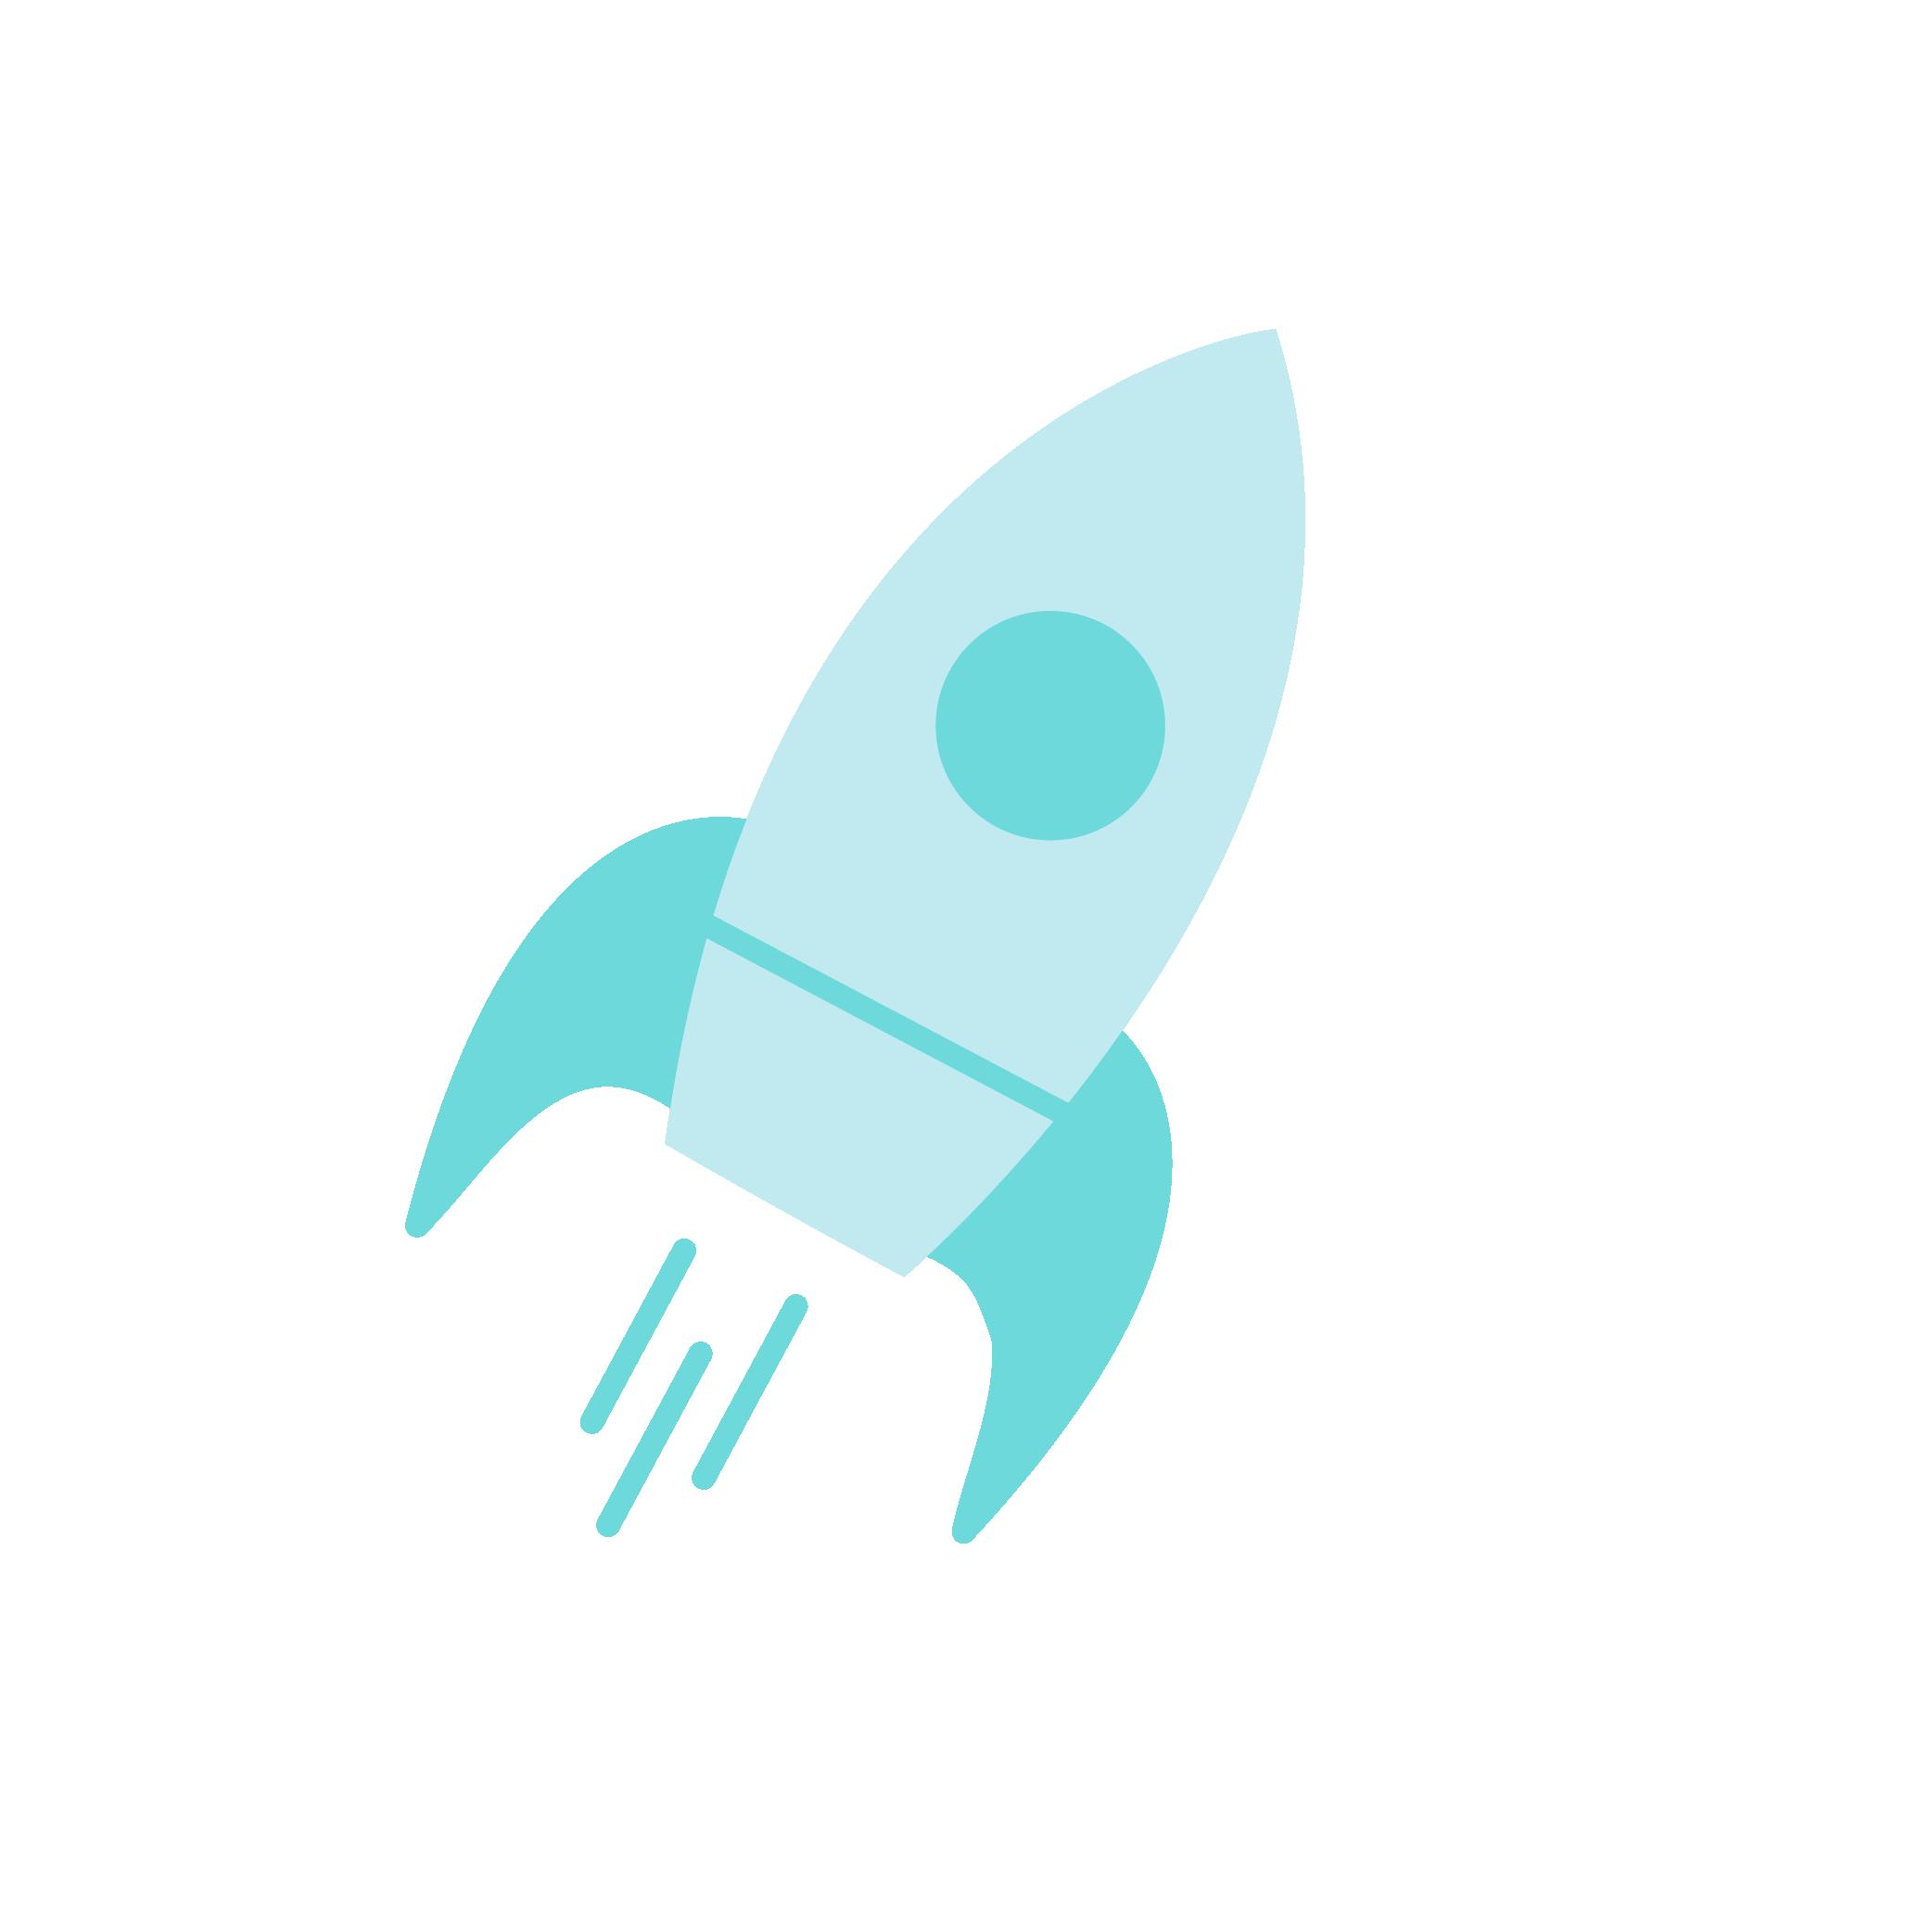 Rocket, Scaleup Icon